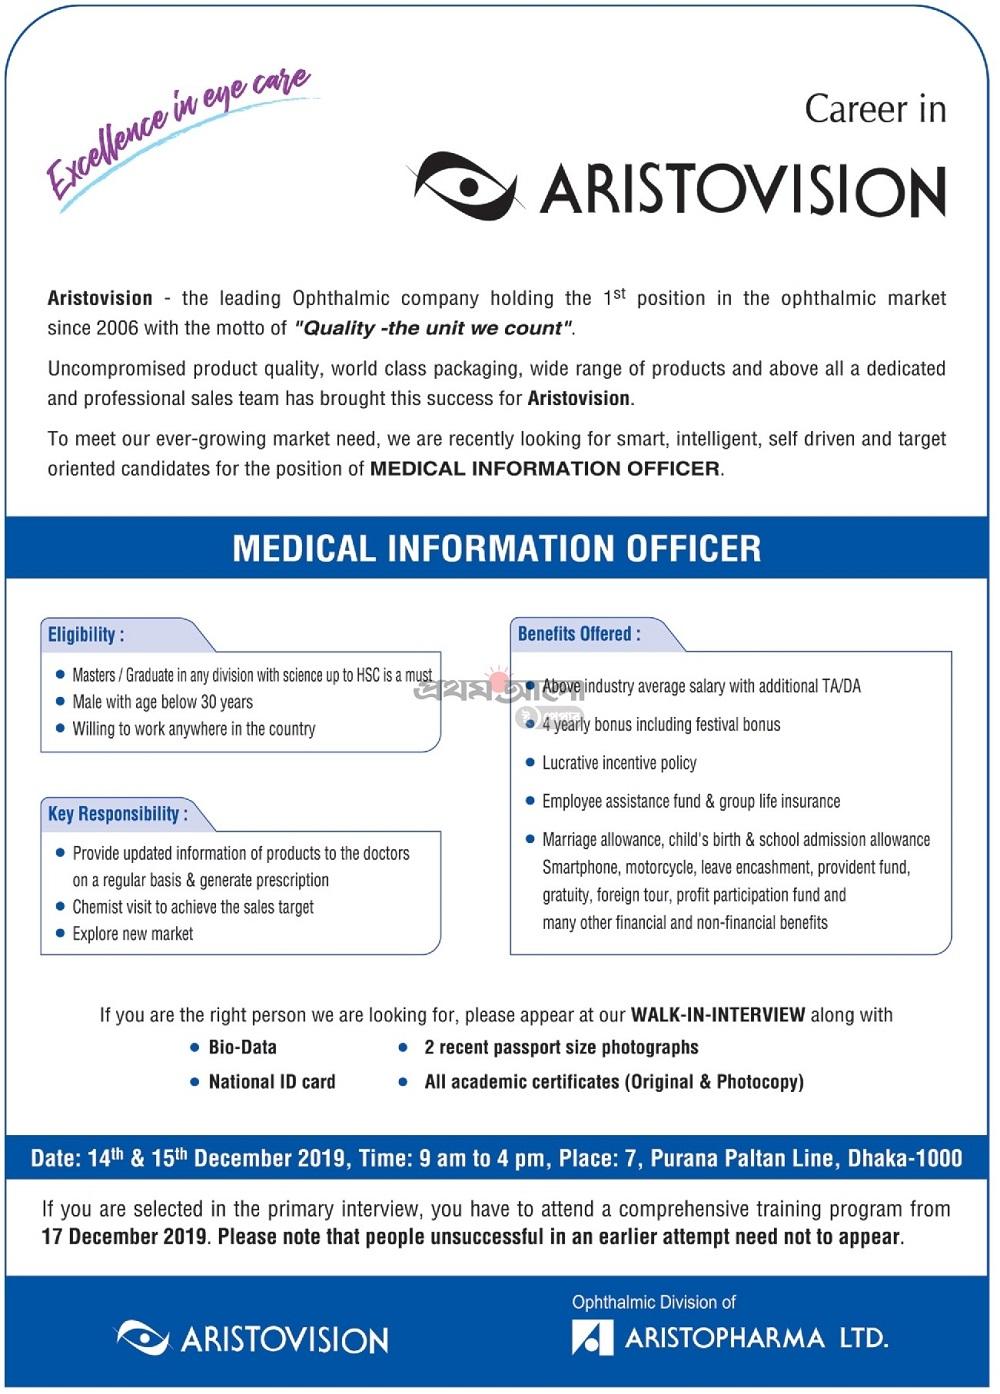 Aristopharma Ltd Job Circular 2019